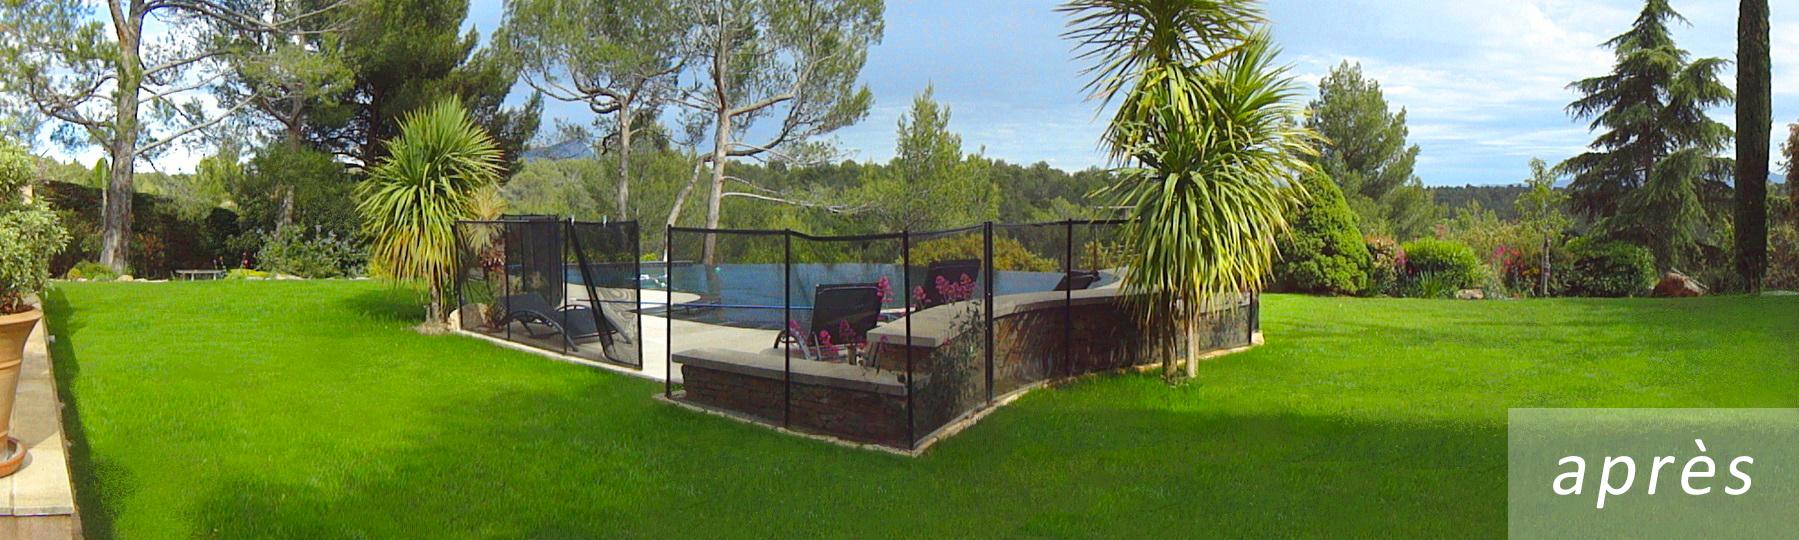 r alisations paysag res sud jardin sud jardin. Black Bedroom Furniture Sets. Home Design Ideas